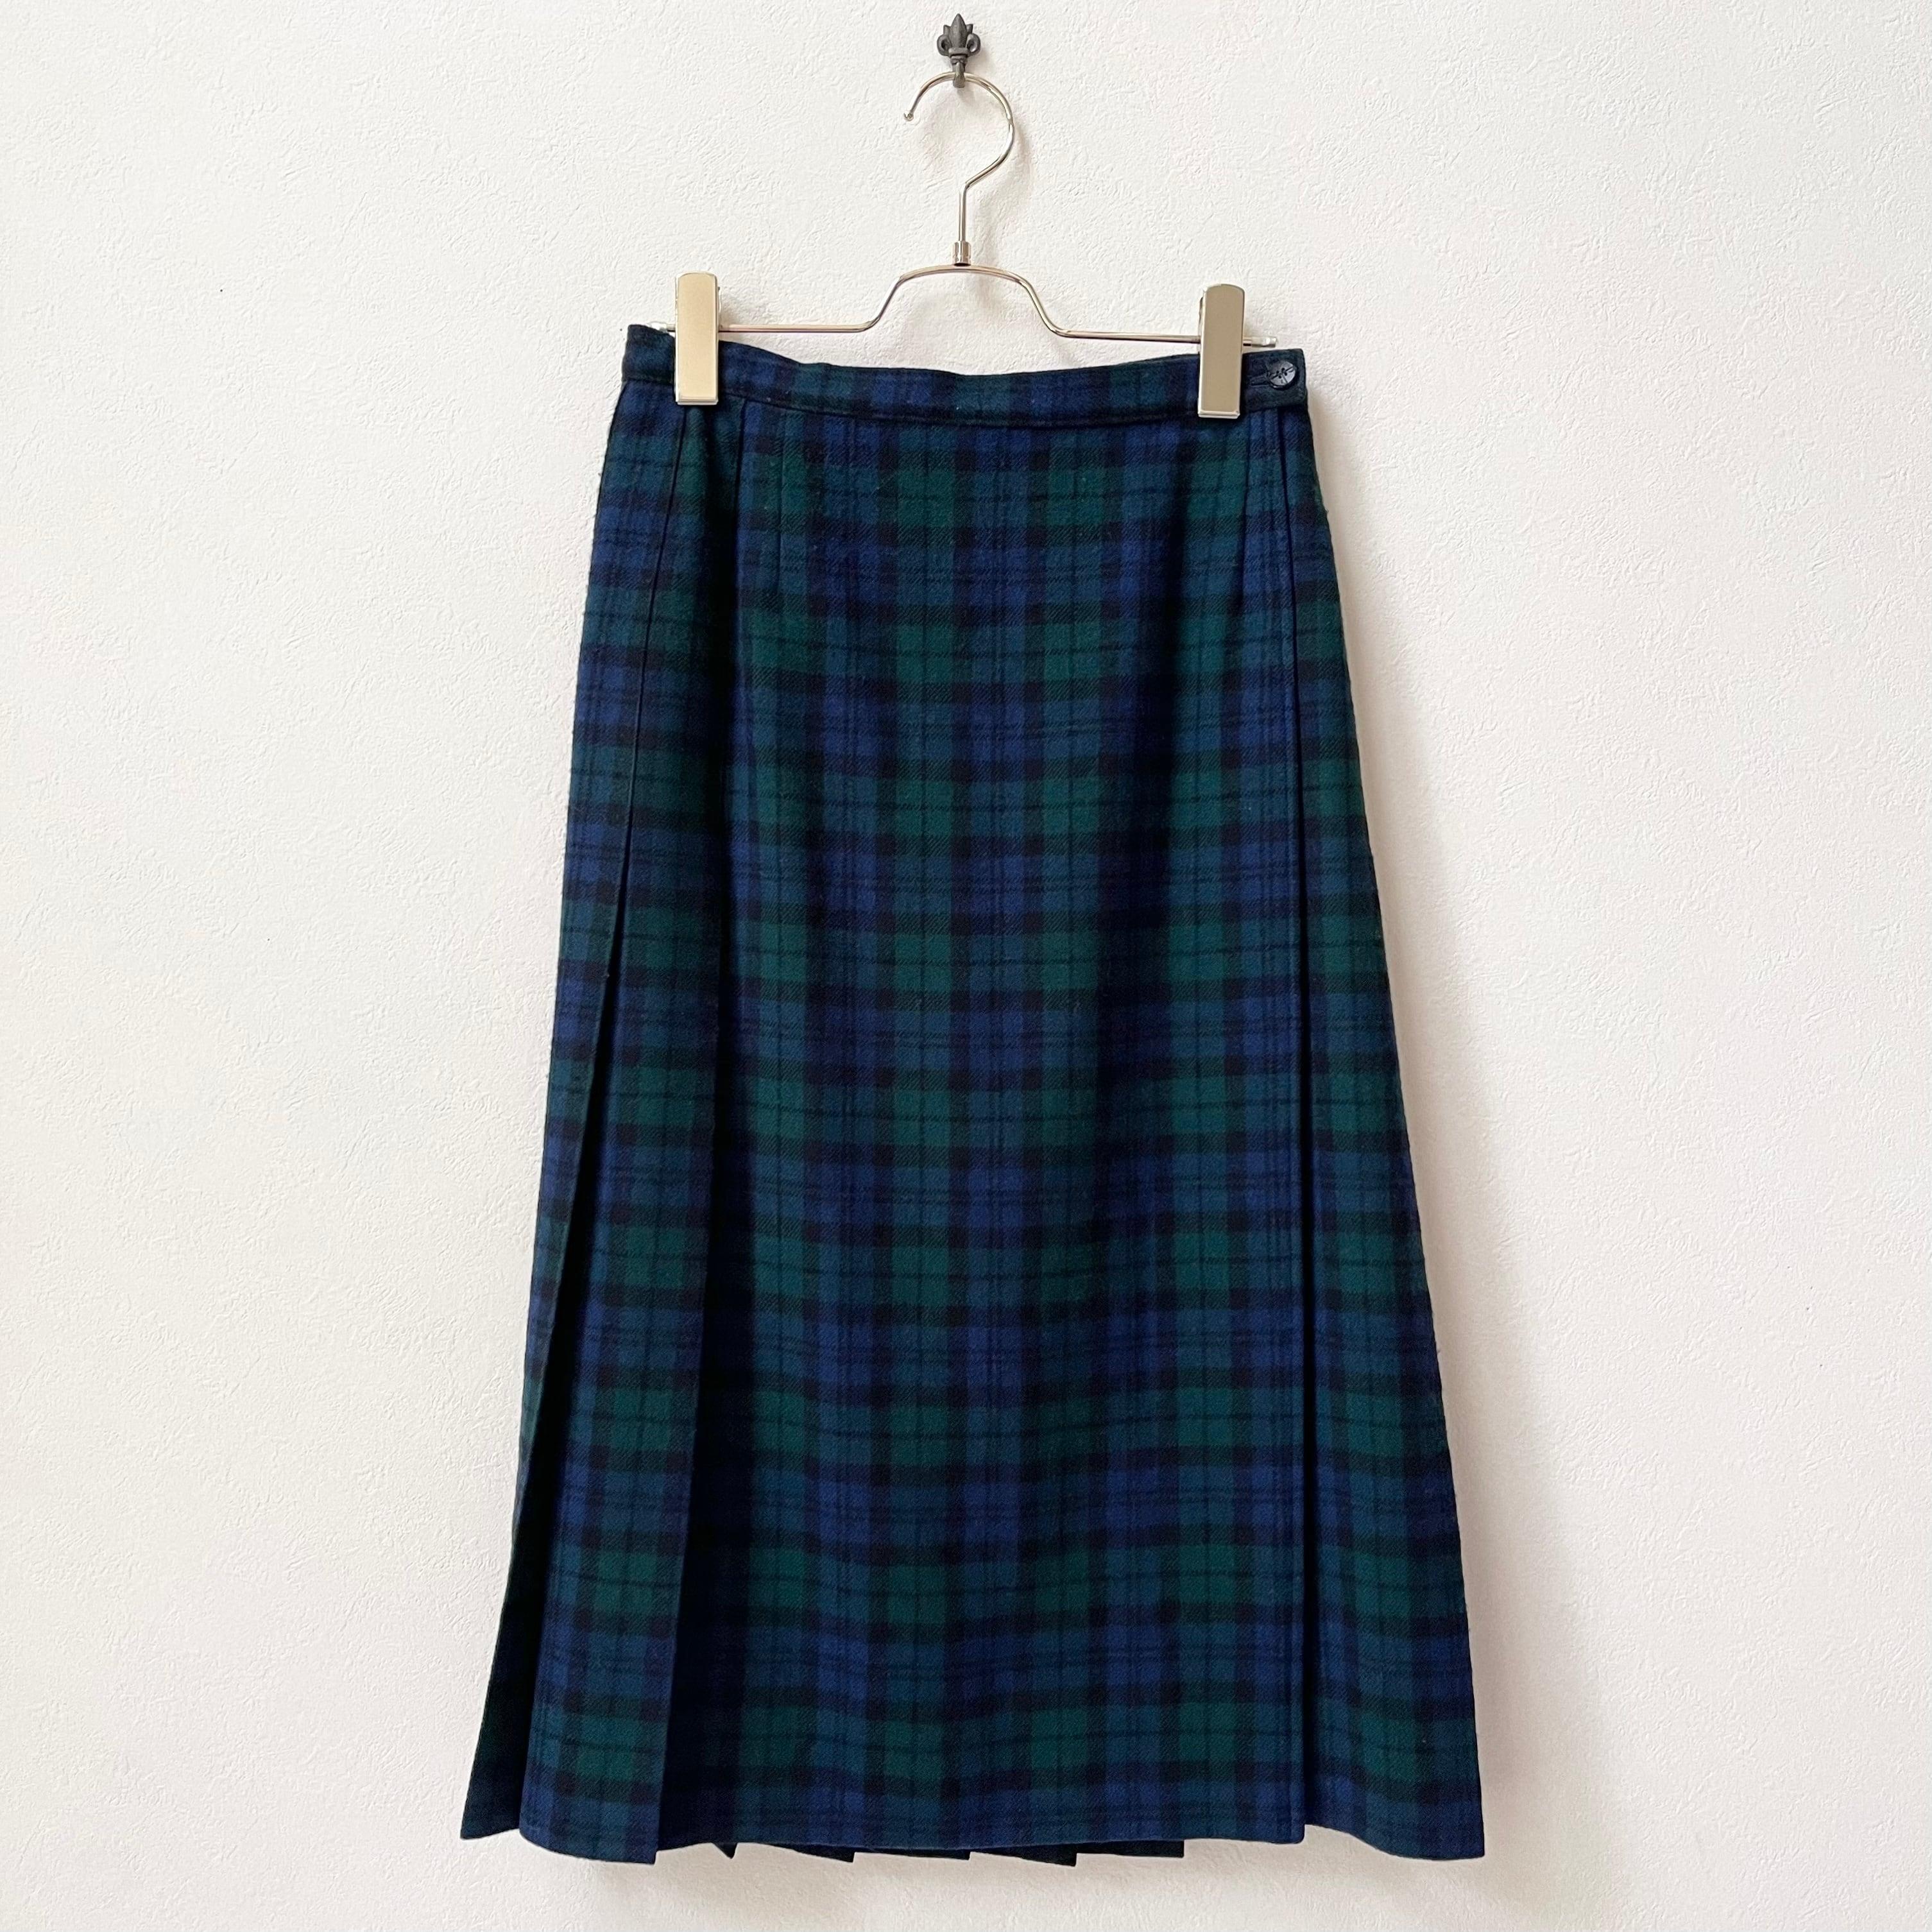 PENDLETON ペンドルトン チェック柄 プリーツラップスカート 70年代 USA製 レディース古着